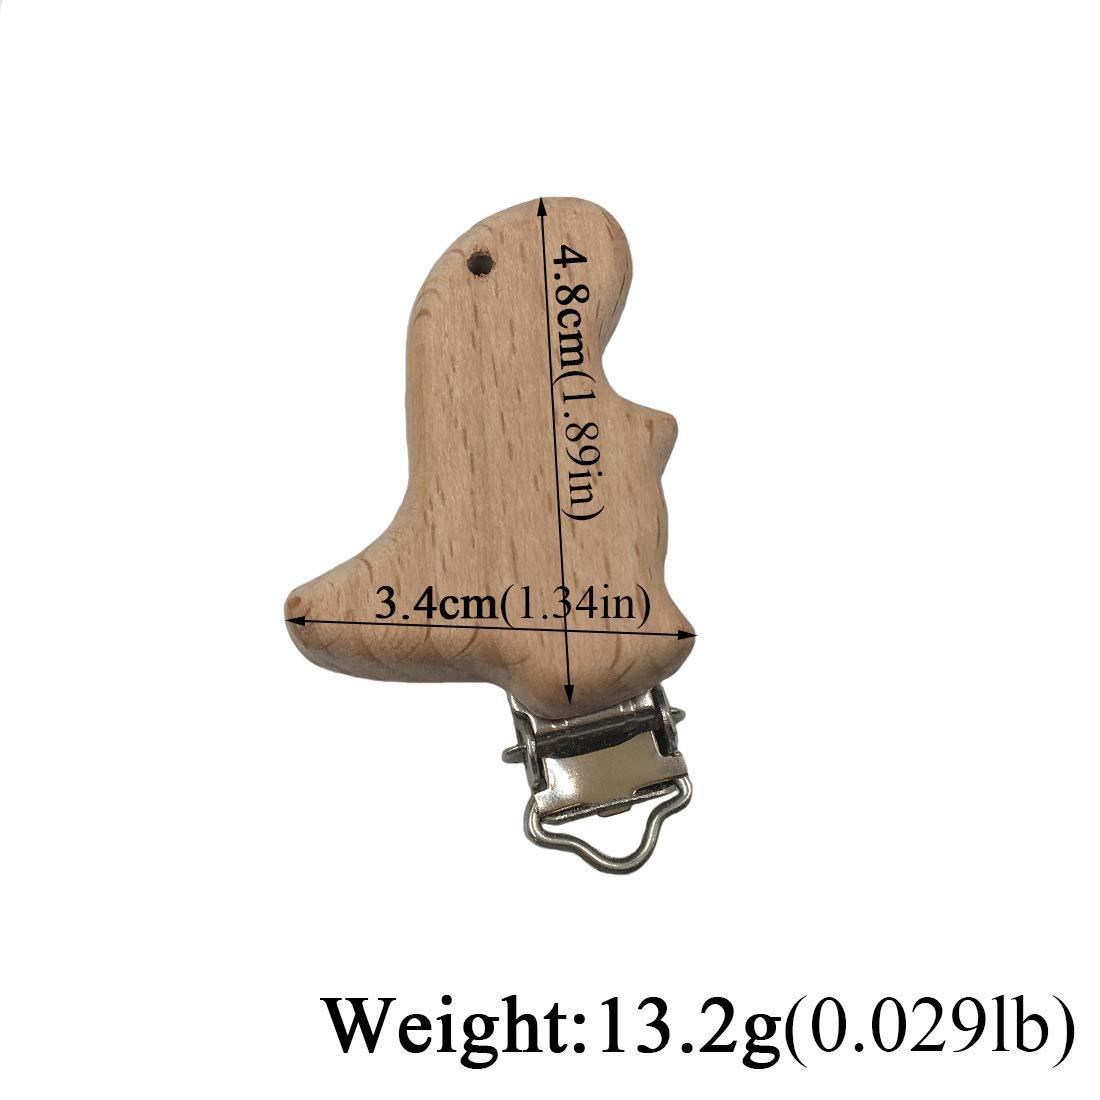 Schnuller Clip 5 St/ück Schnullerclip Nuckel-Clip Nippel Halter f/ür Baby und Kind Holz Schnullerketten Clips//Dummy Nippel Halter S/äugling Schnuller Verschl/üsse Halter Zubeh/ör